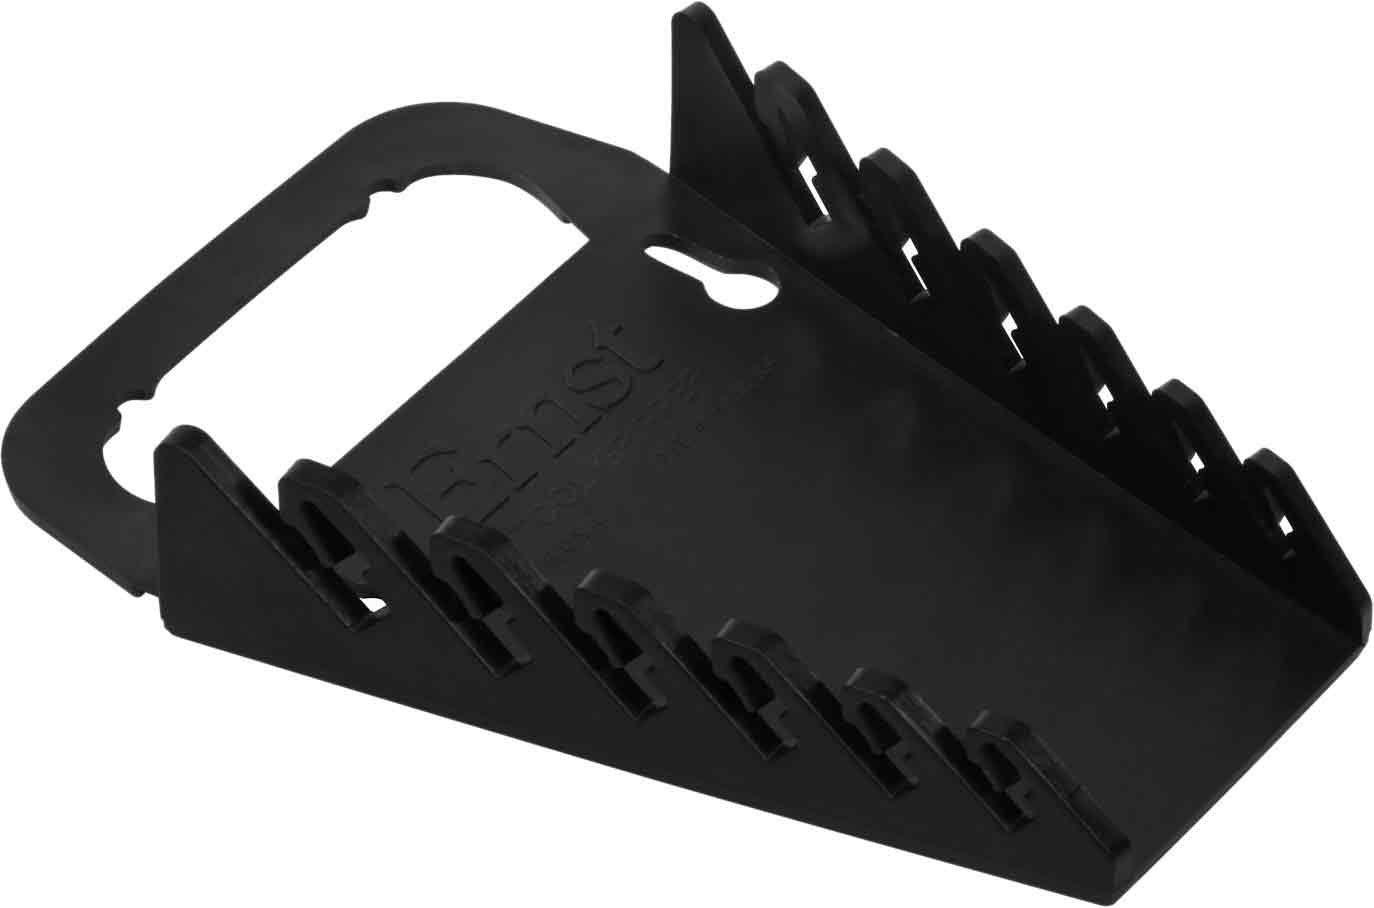 Red 10 Tool Ernst Manufacturing Gripper Wrench Organizer